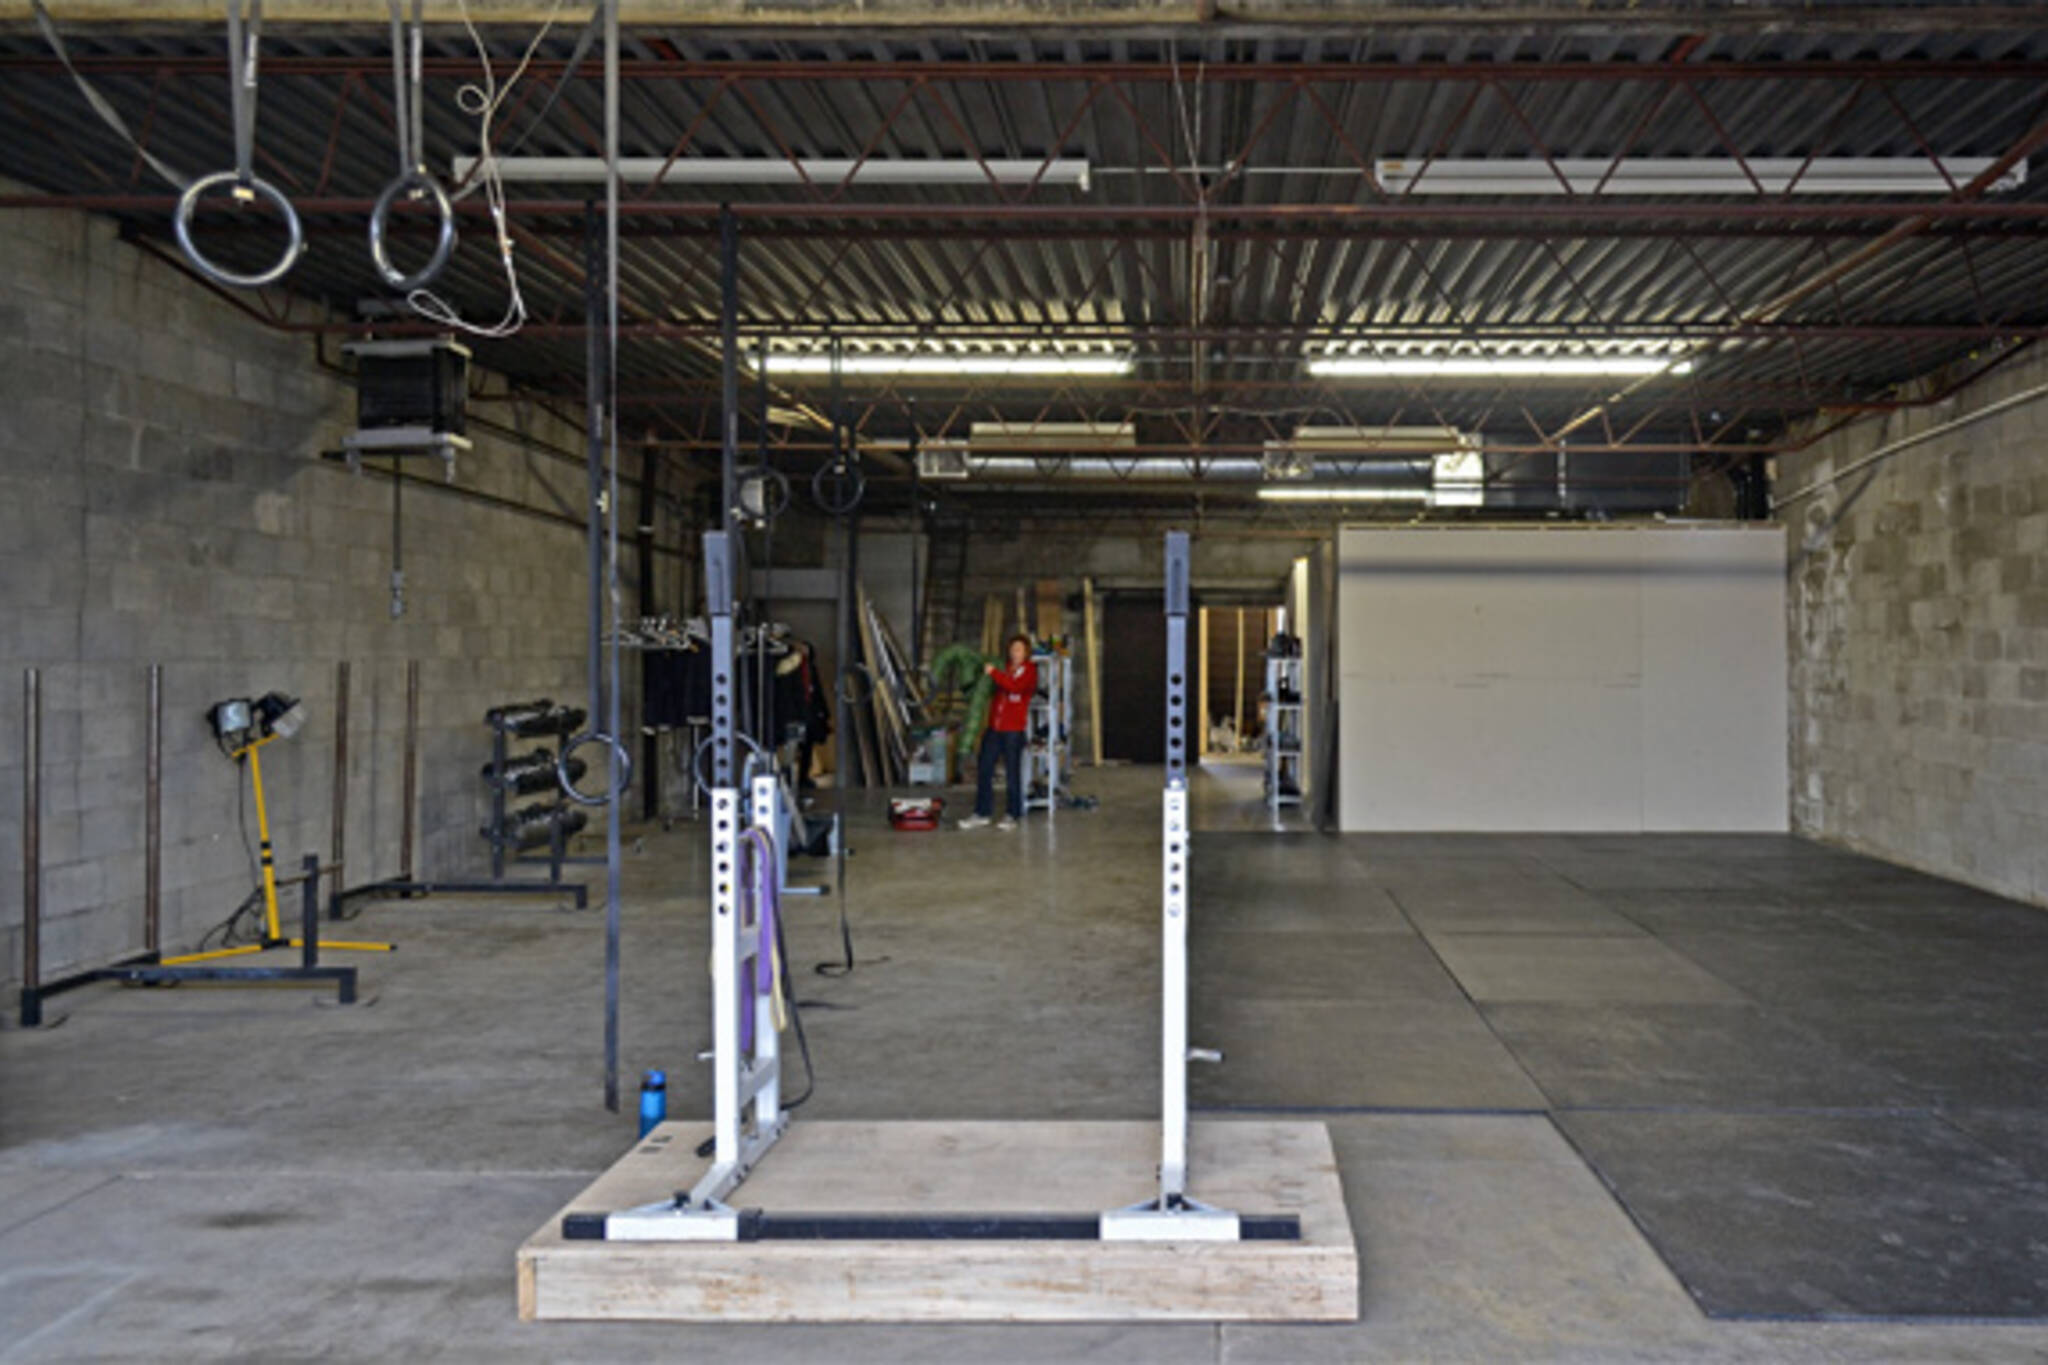 CrossFit Gym Toronto